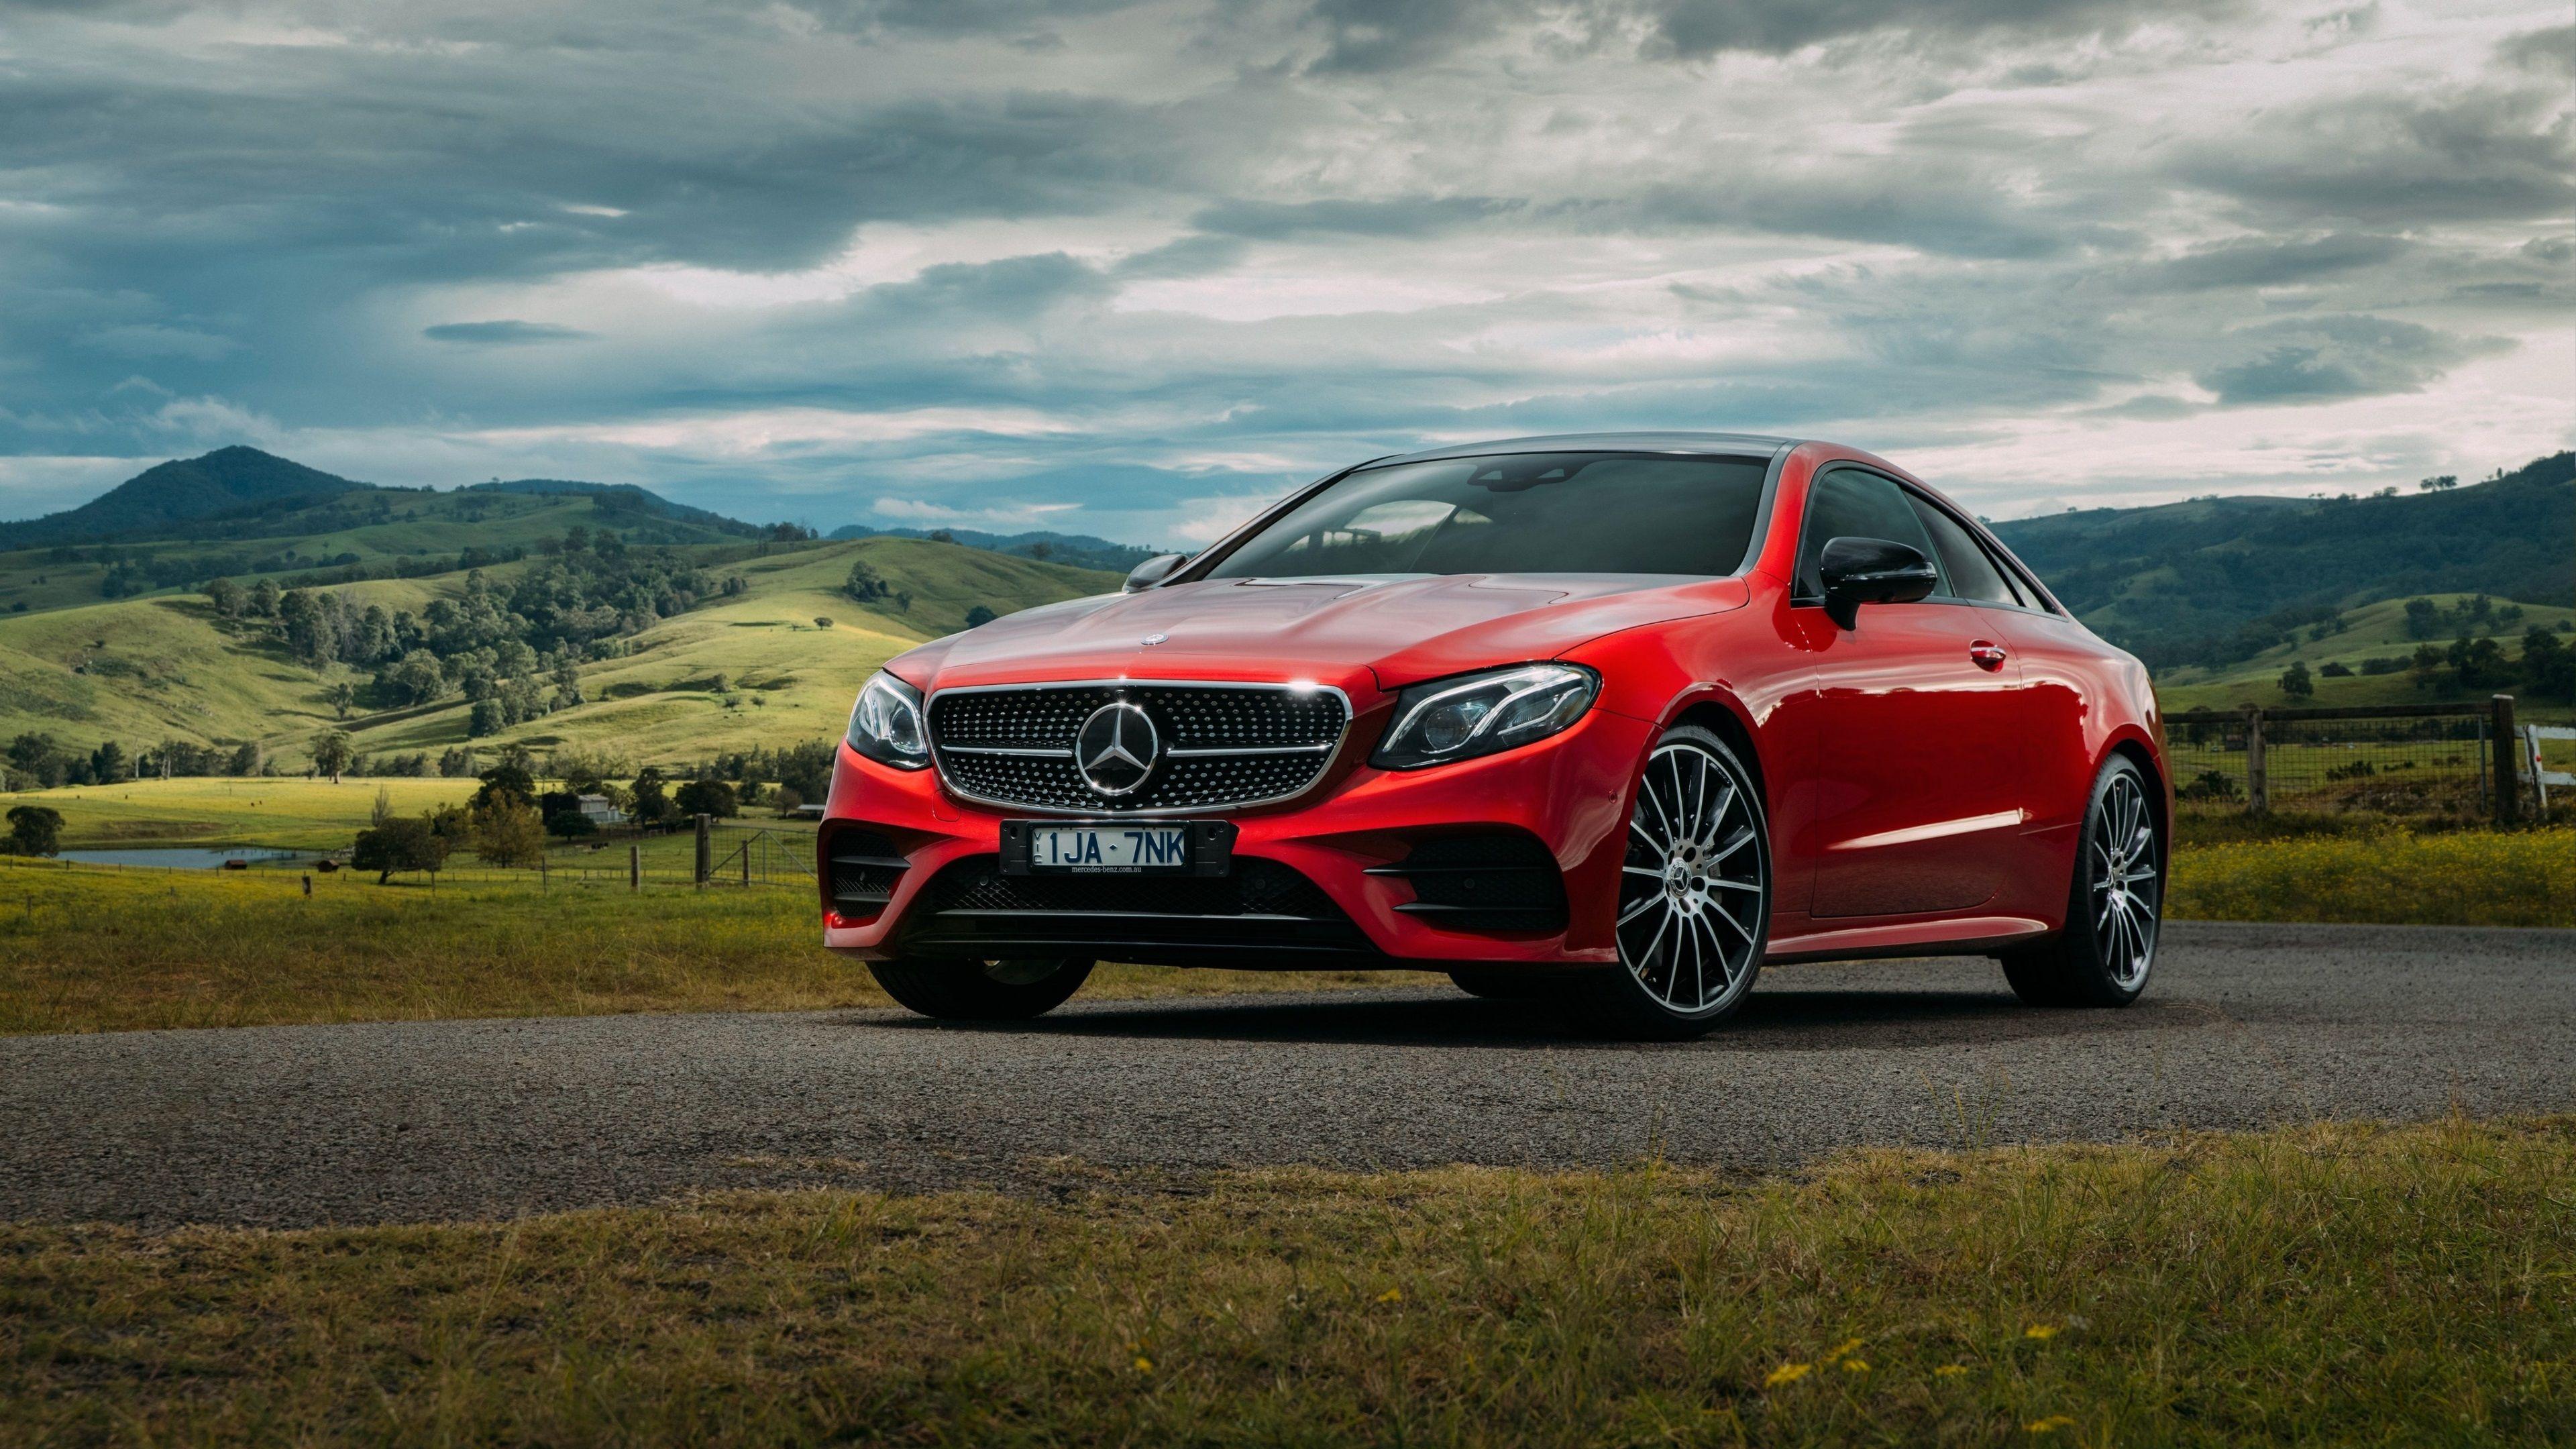 Benz 4K Wallpapers - Top Free Benz 4K Backgrounds ...